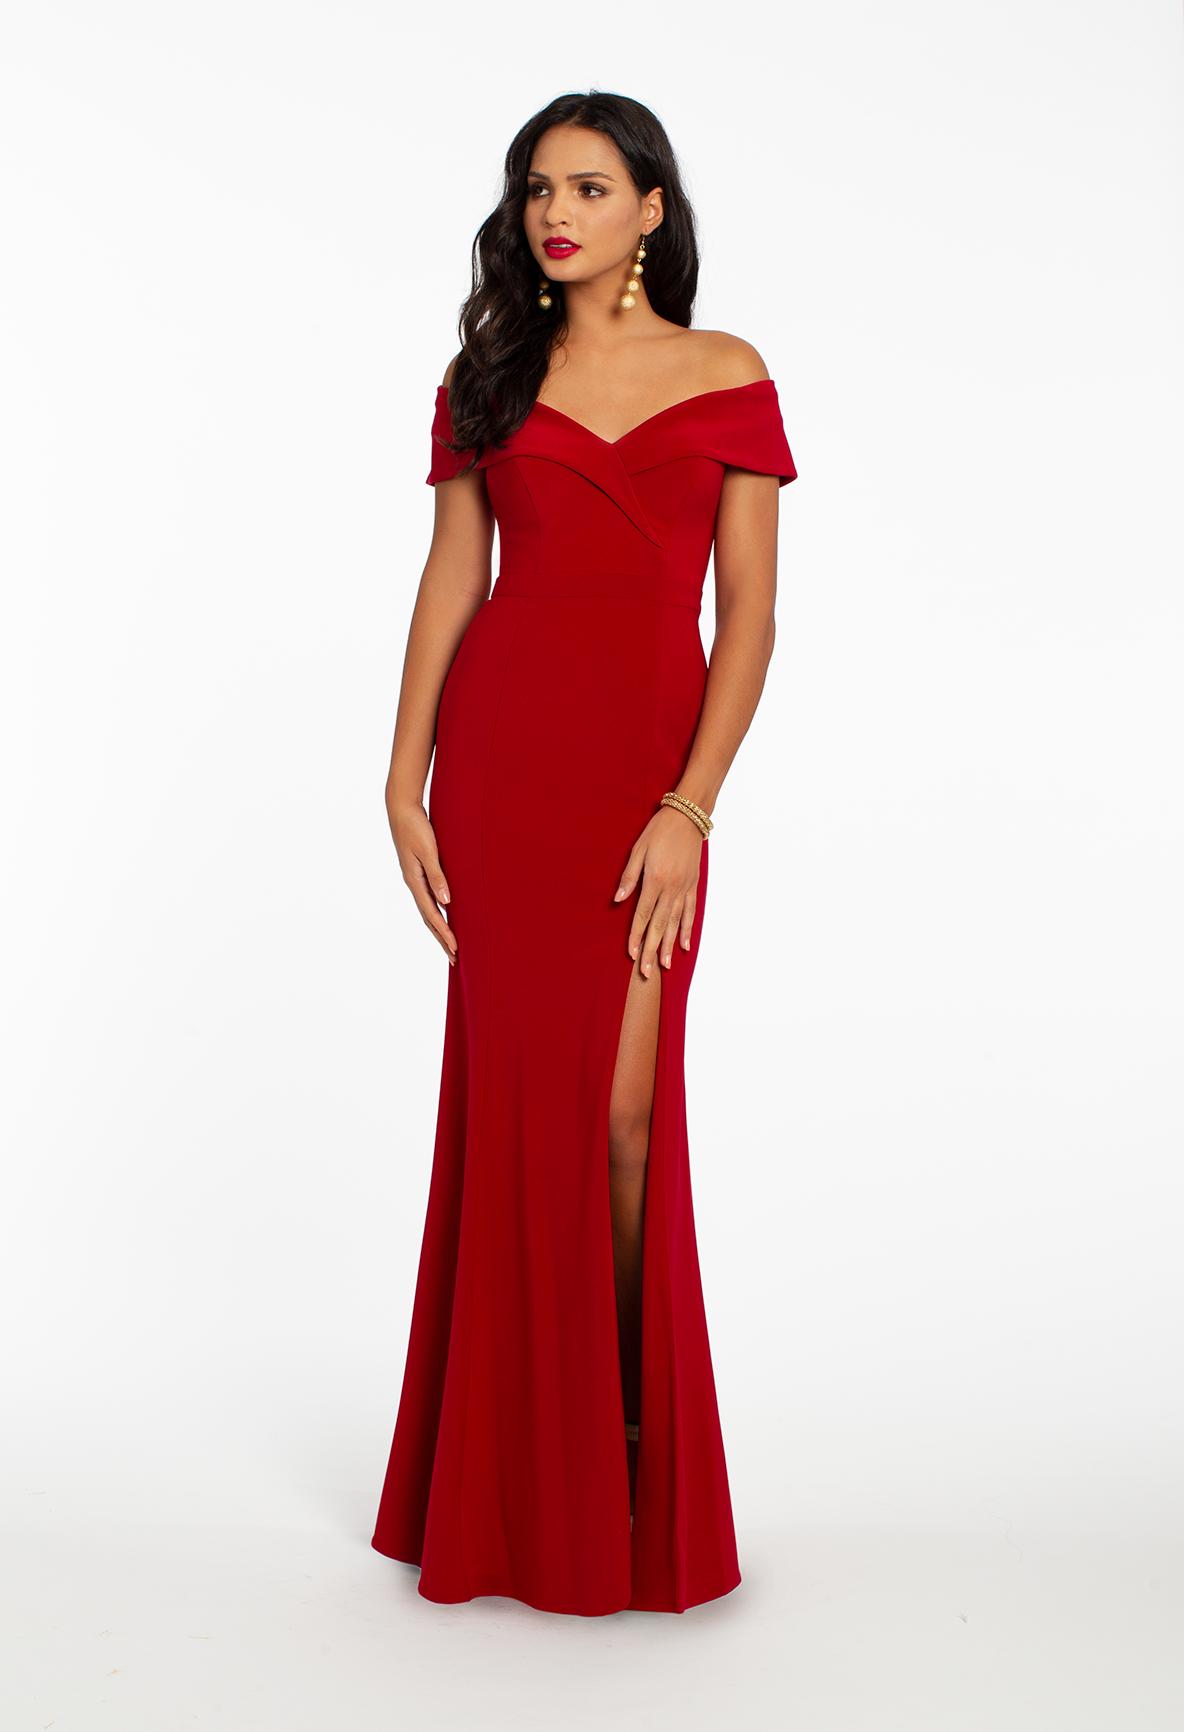 Off the shoulder fused dress in wear red pinterest